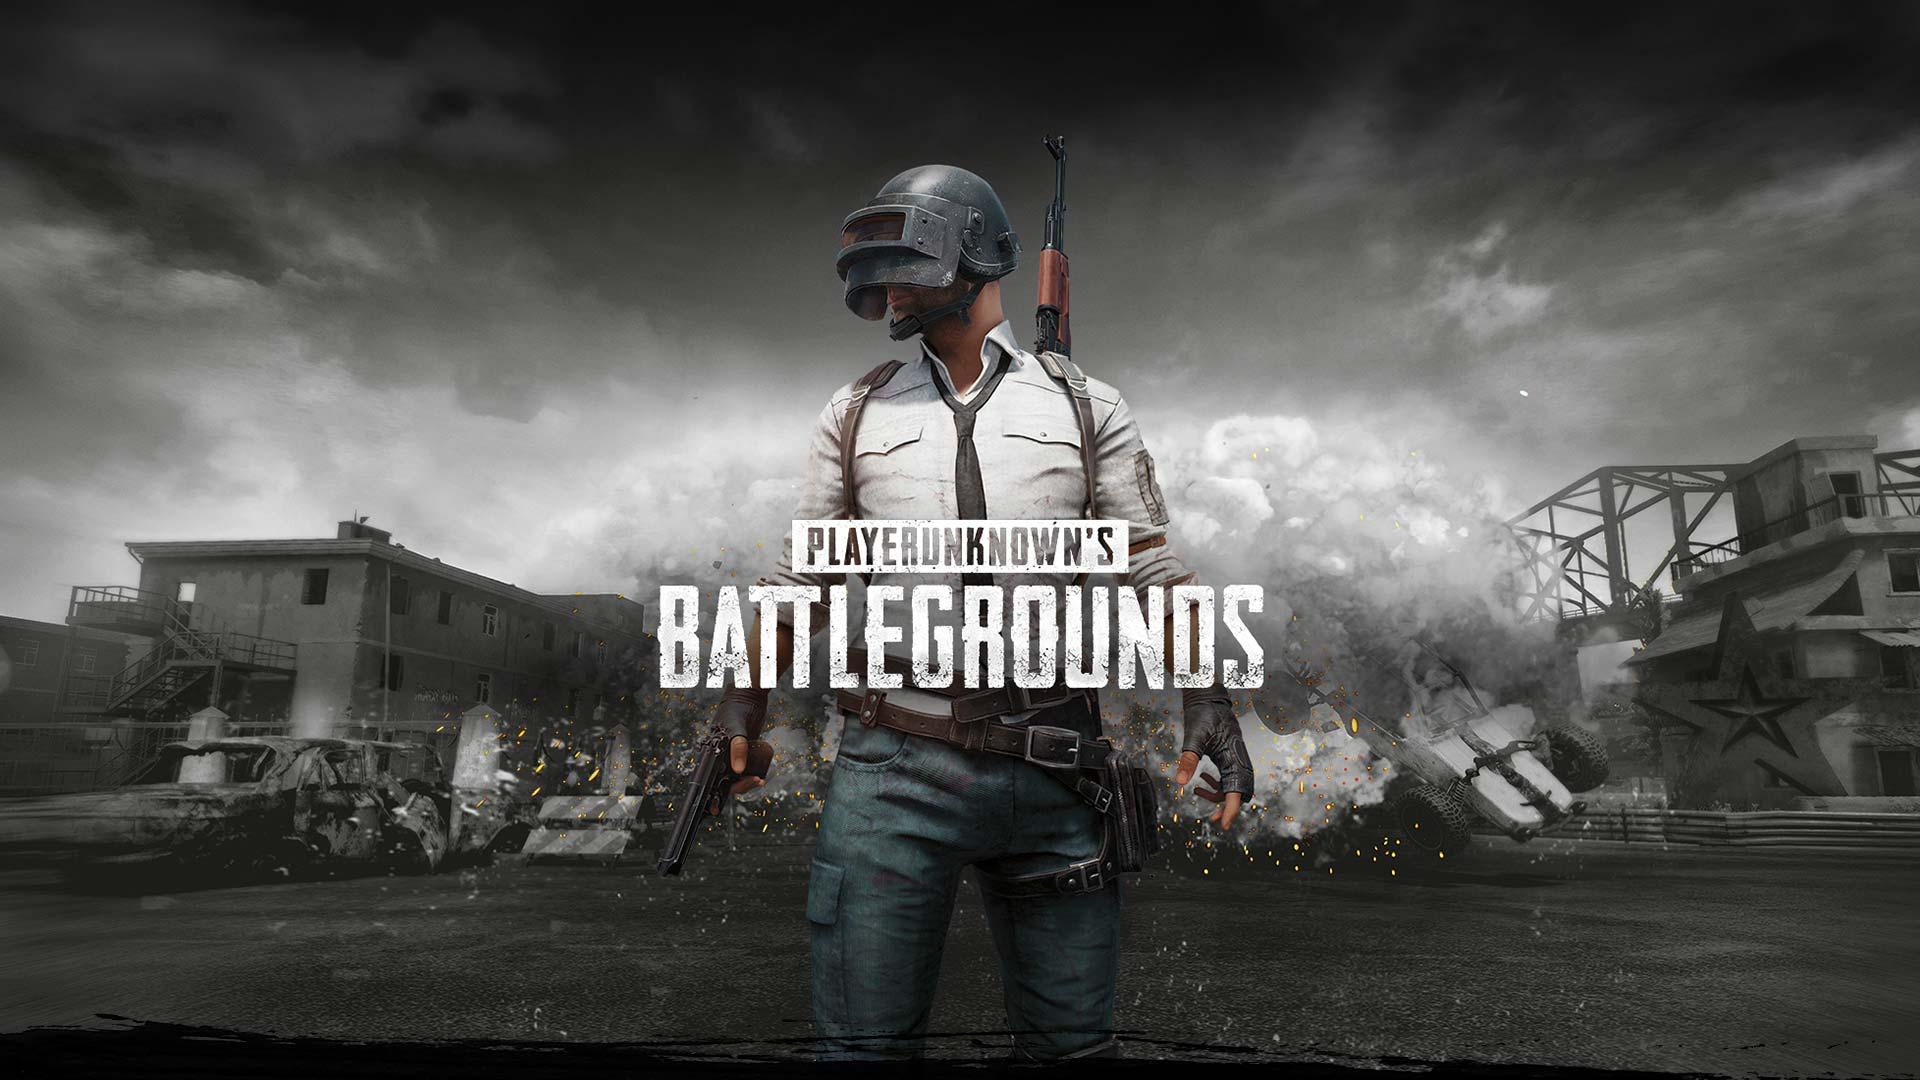 playerunknowns battlegrounds come